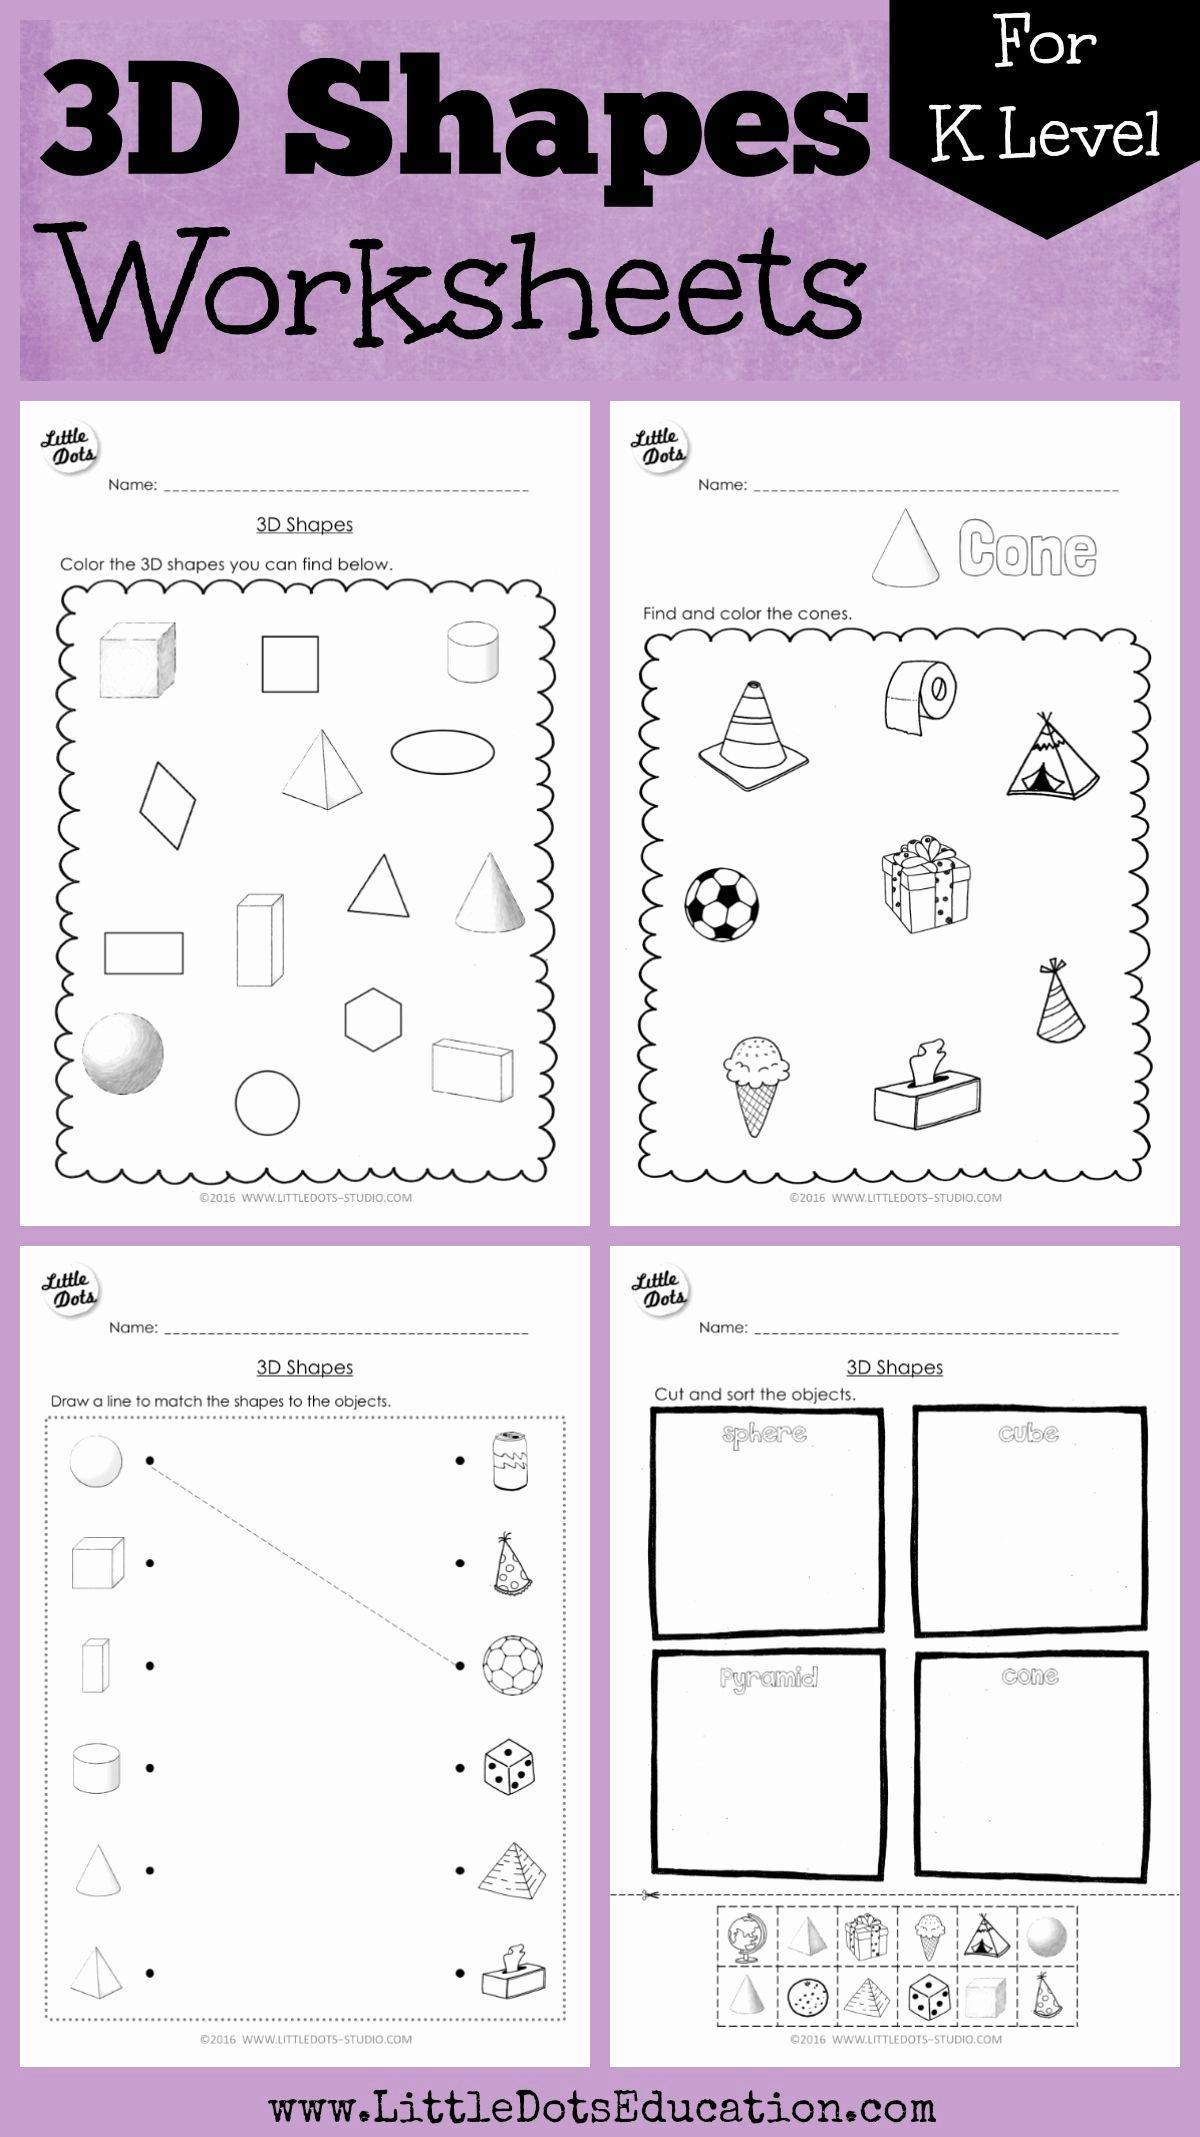 Cone Worksheets for Preschoolers Beautiful Kindergarten Math 3d Shapes Worksheets and Activities